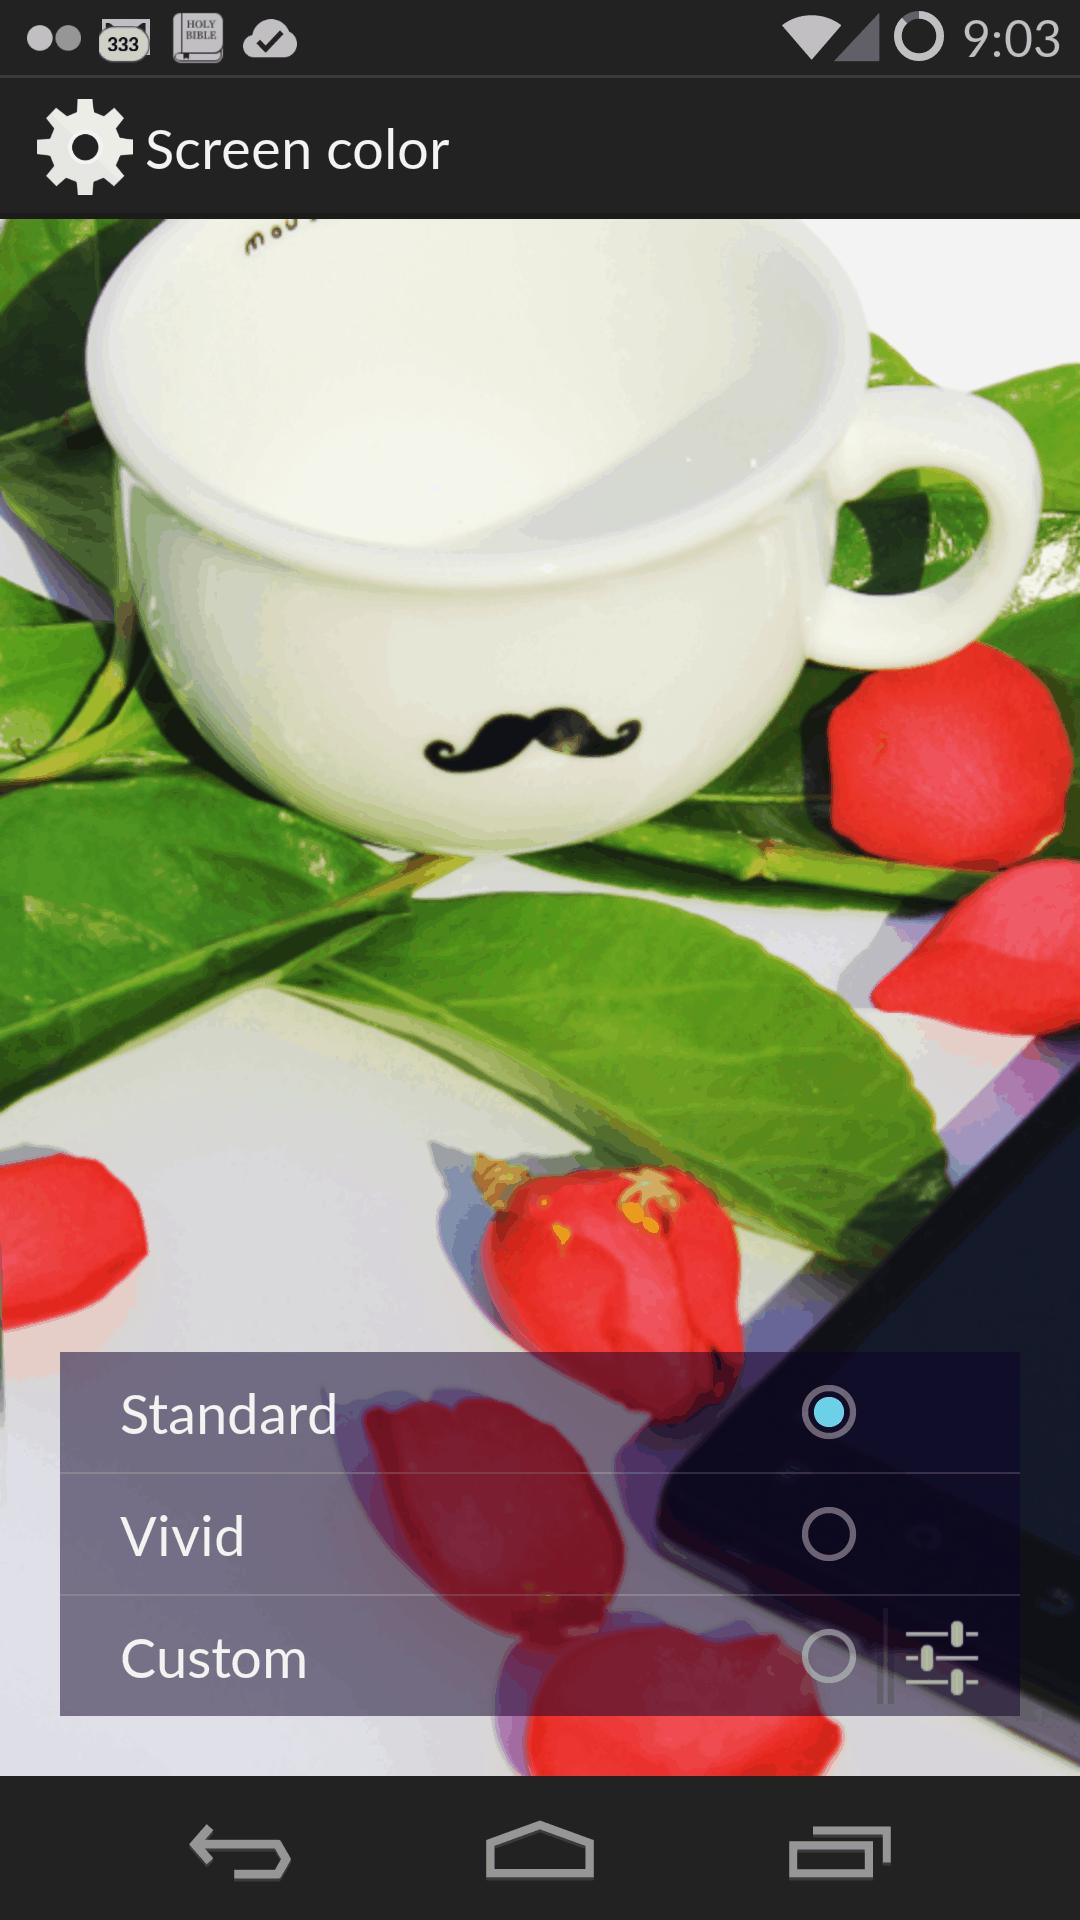 Screenshot 2014 07 01 09 03 30